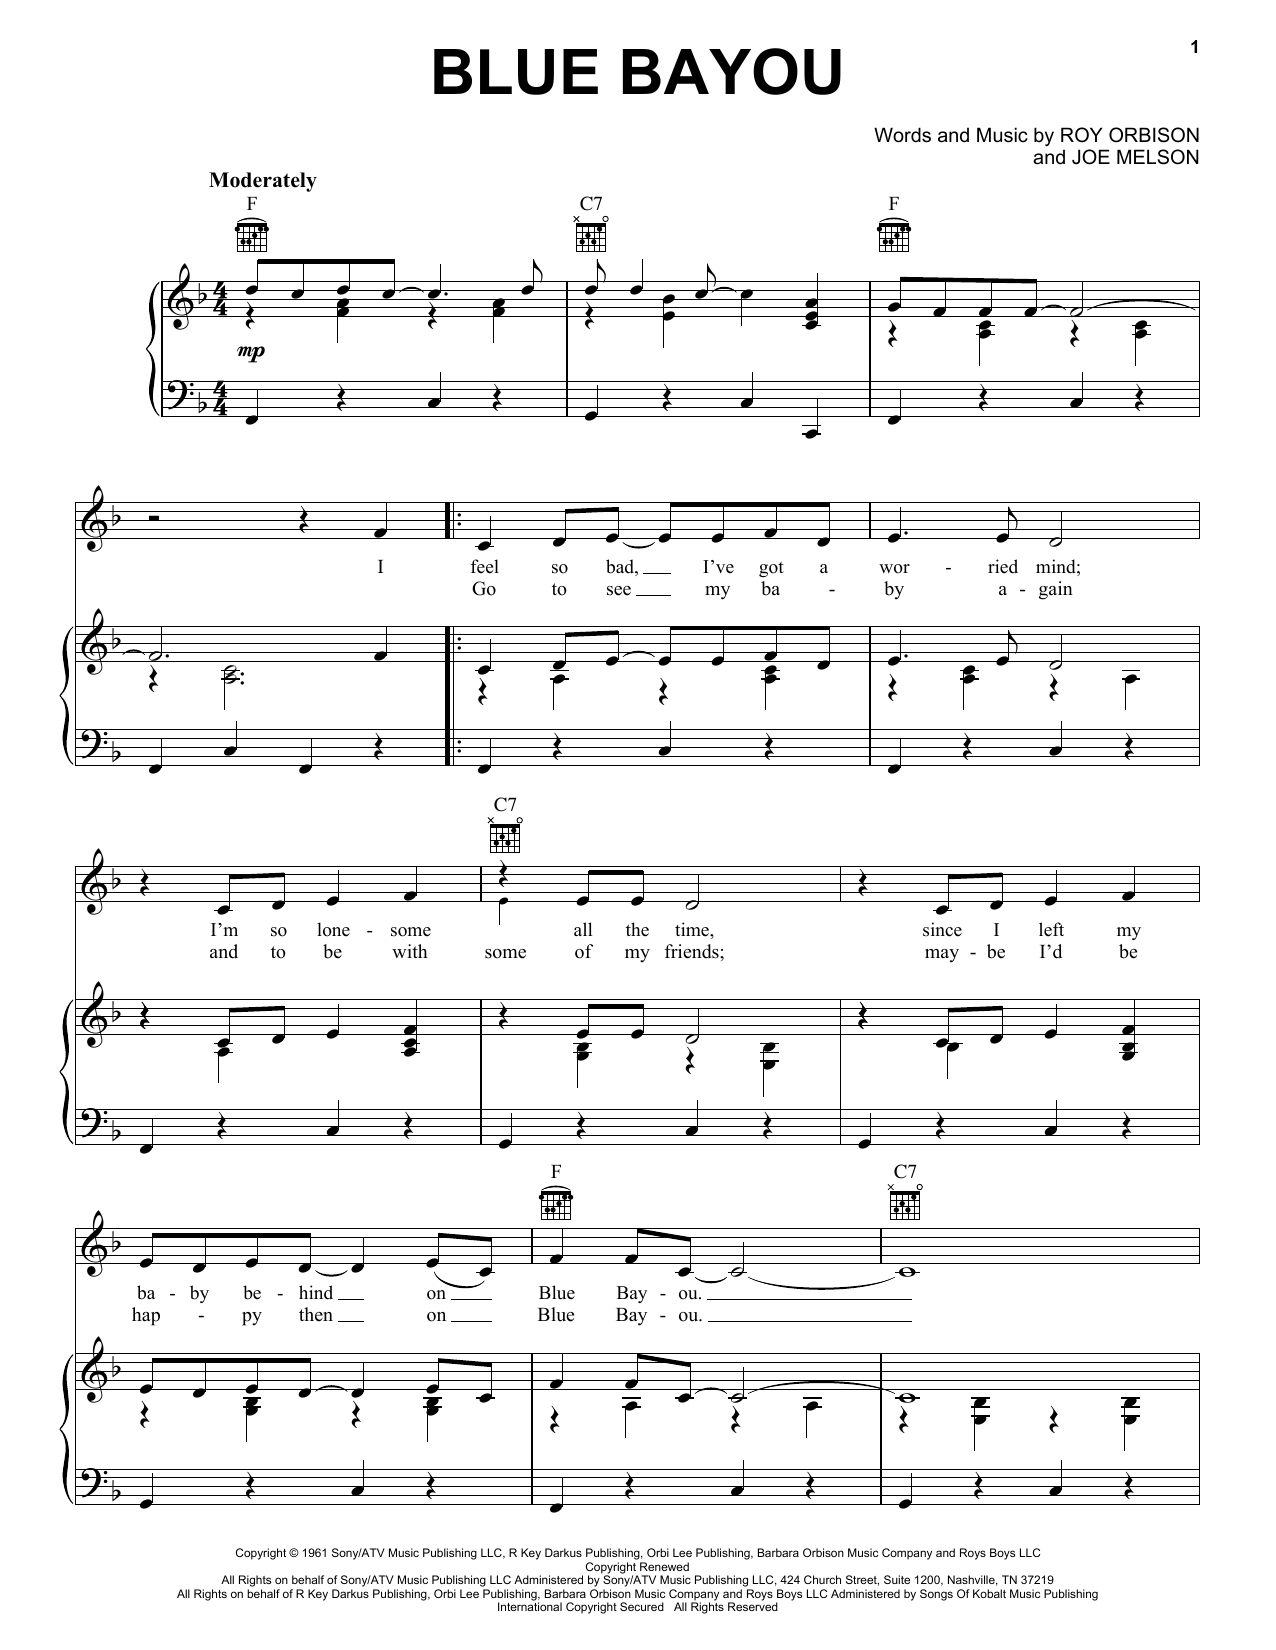 Blue Bayou sheet music